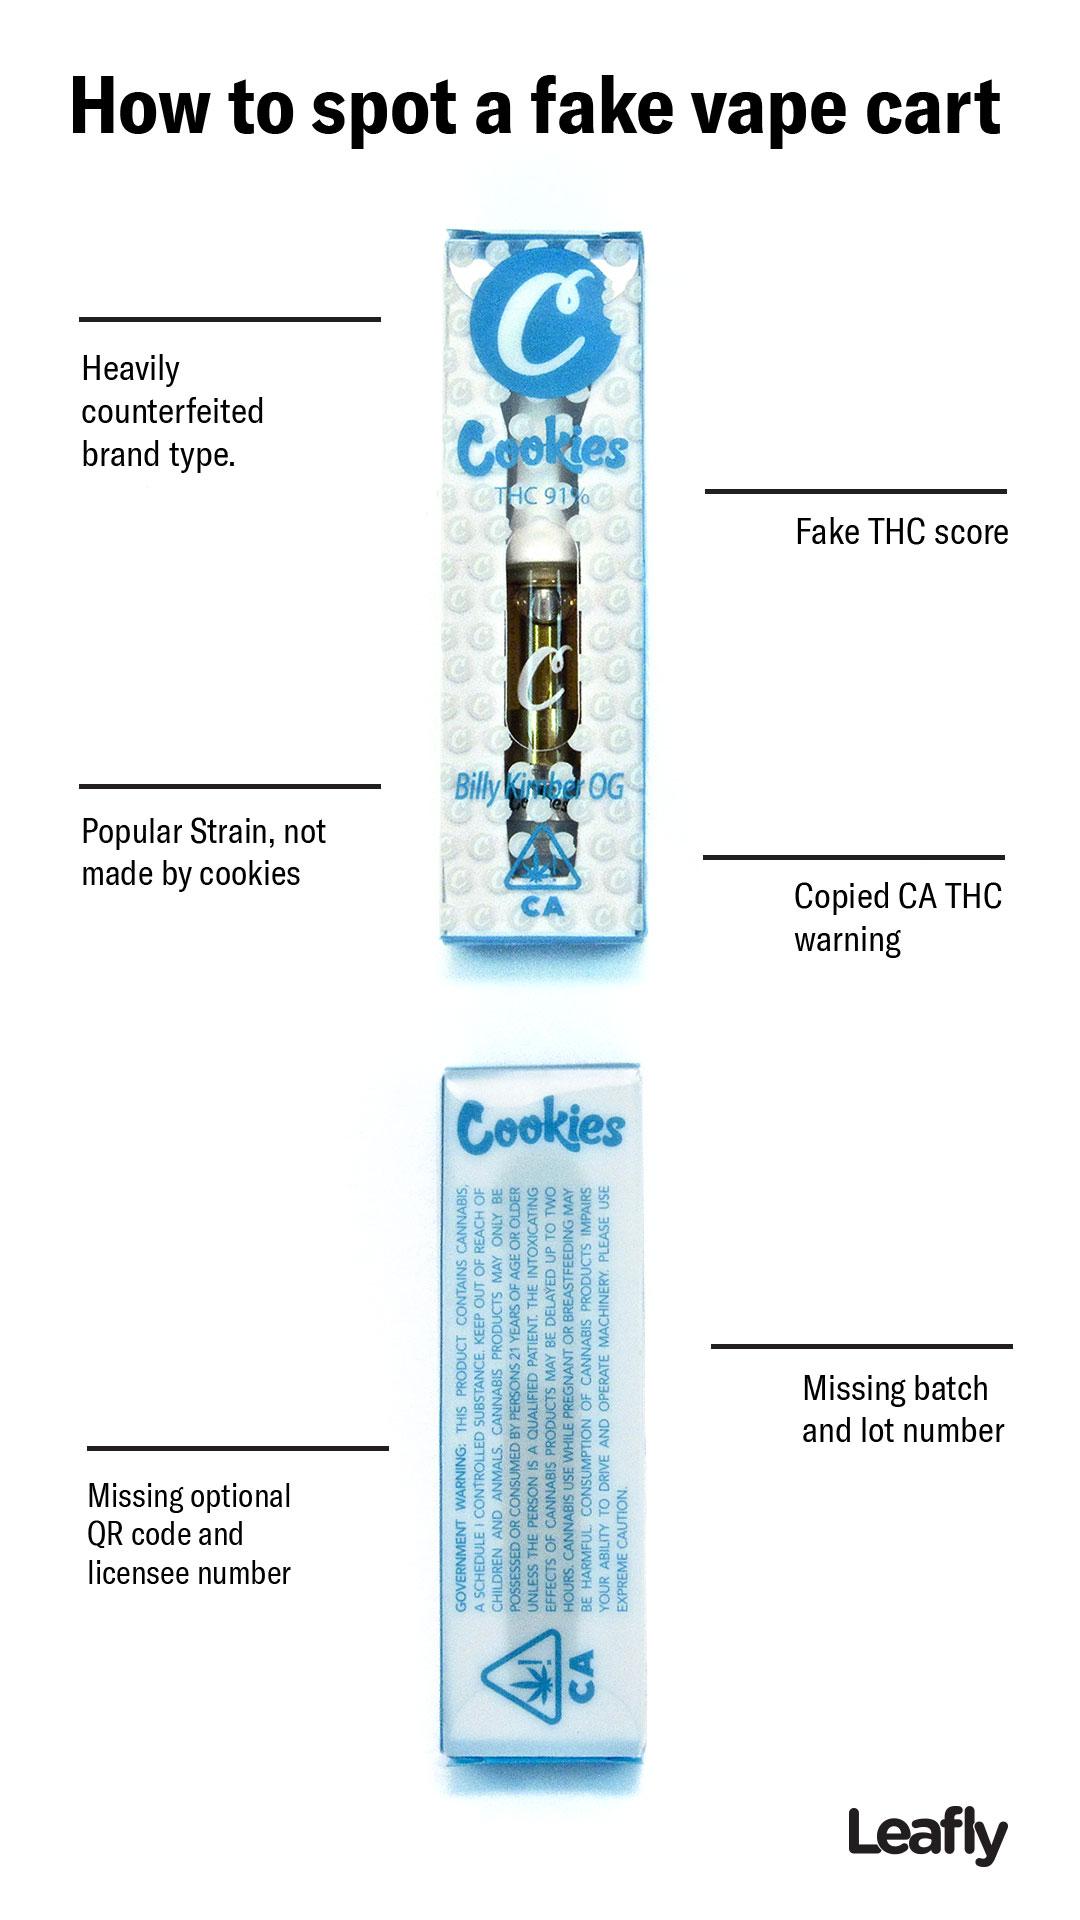 How To Spot A Fake Vape Cartridge Quality Thc Portal